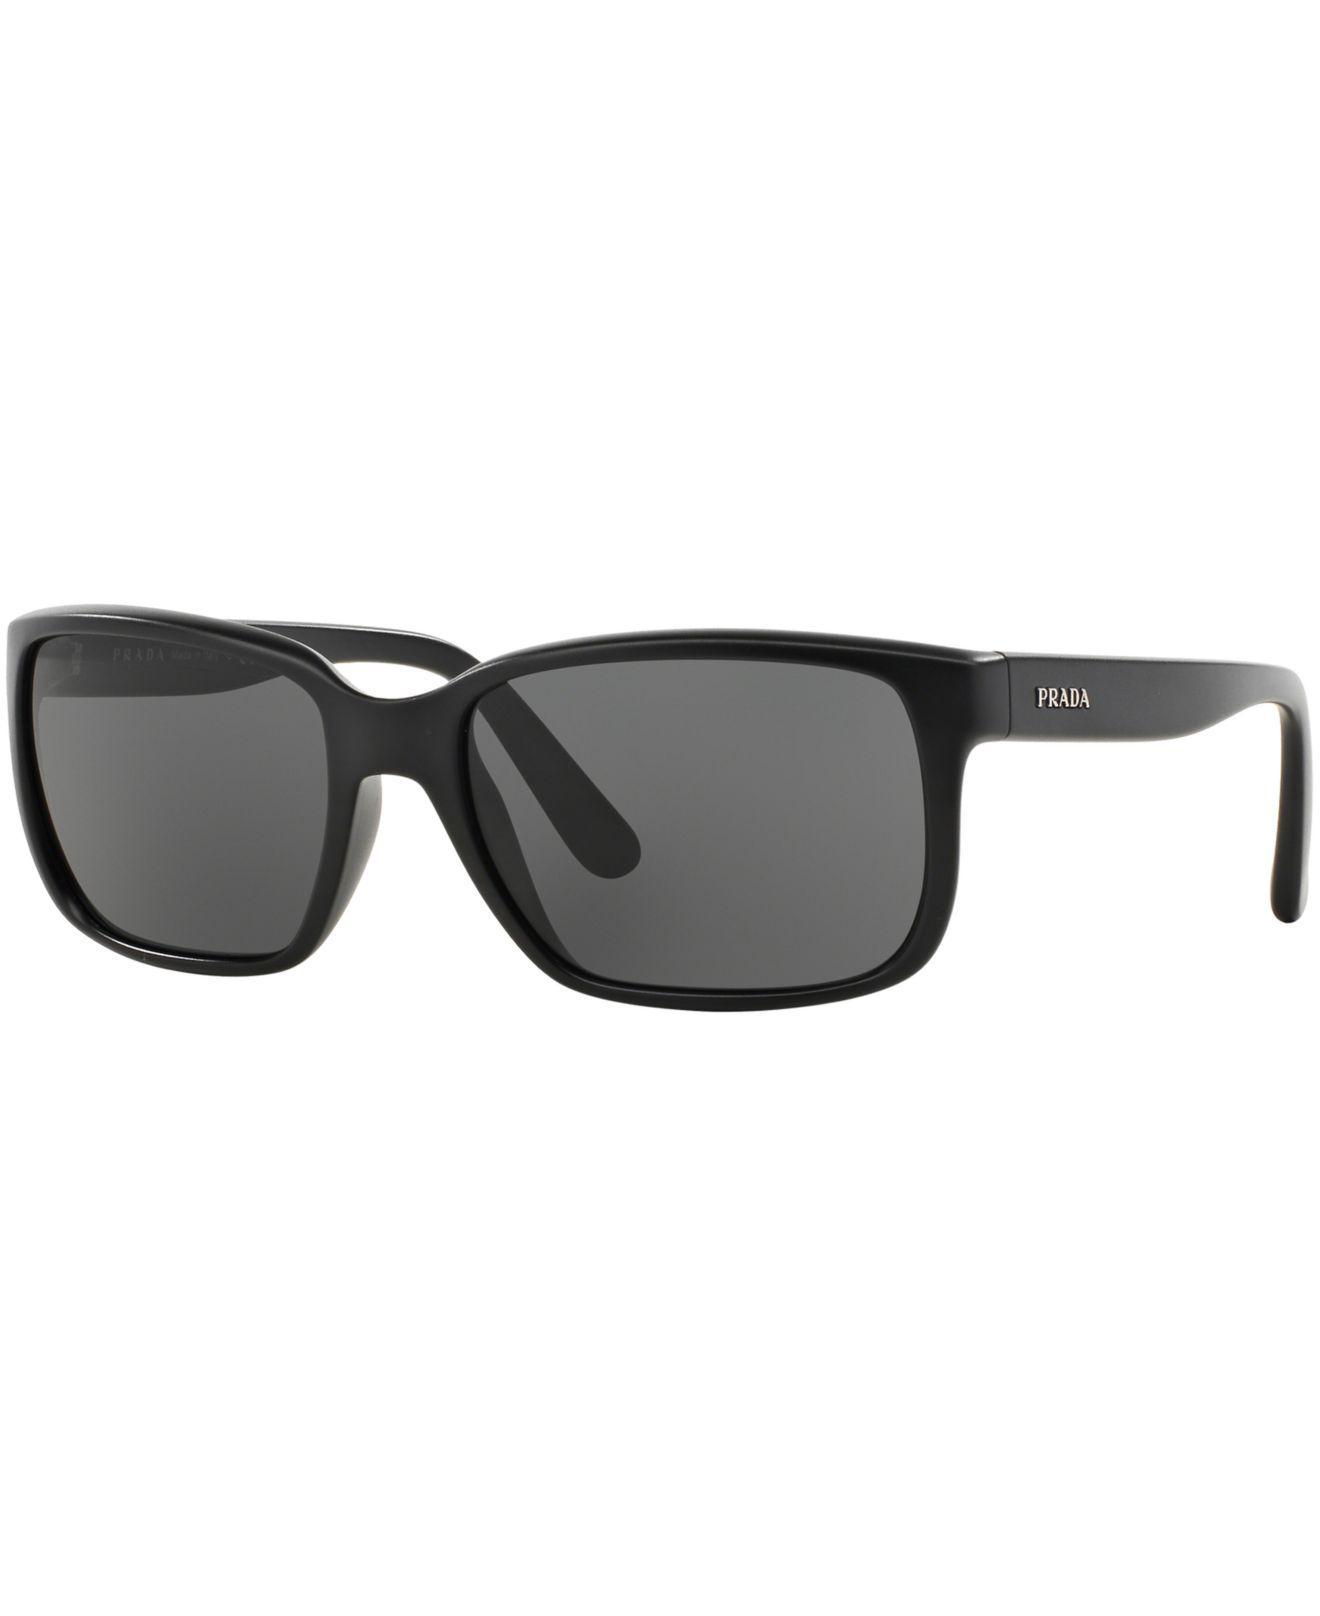 71b472b391 Prada - Black Sunglasses